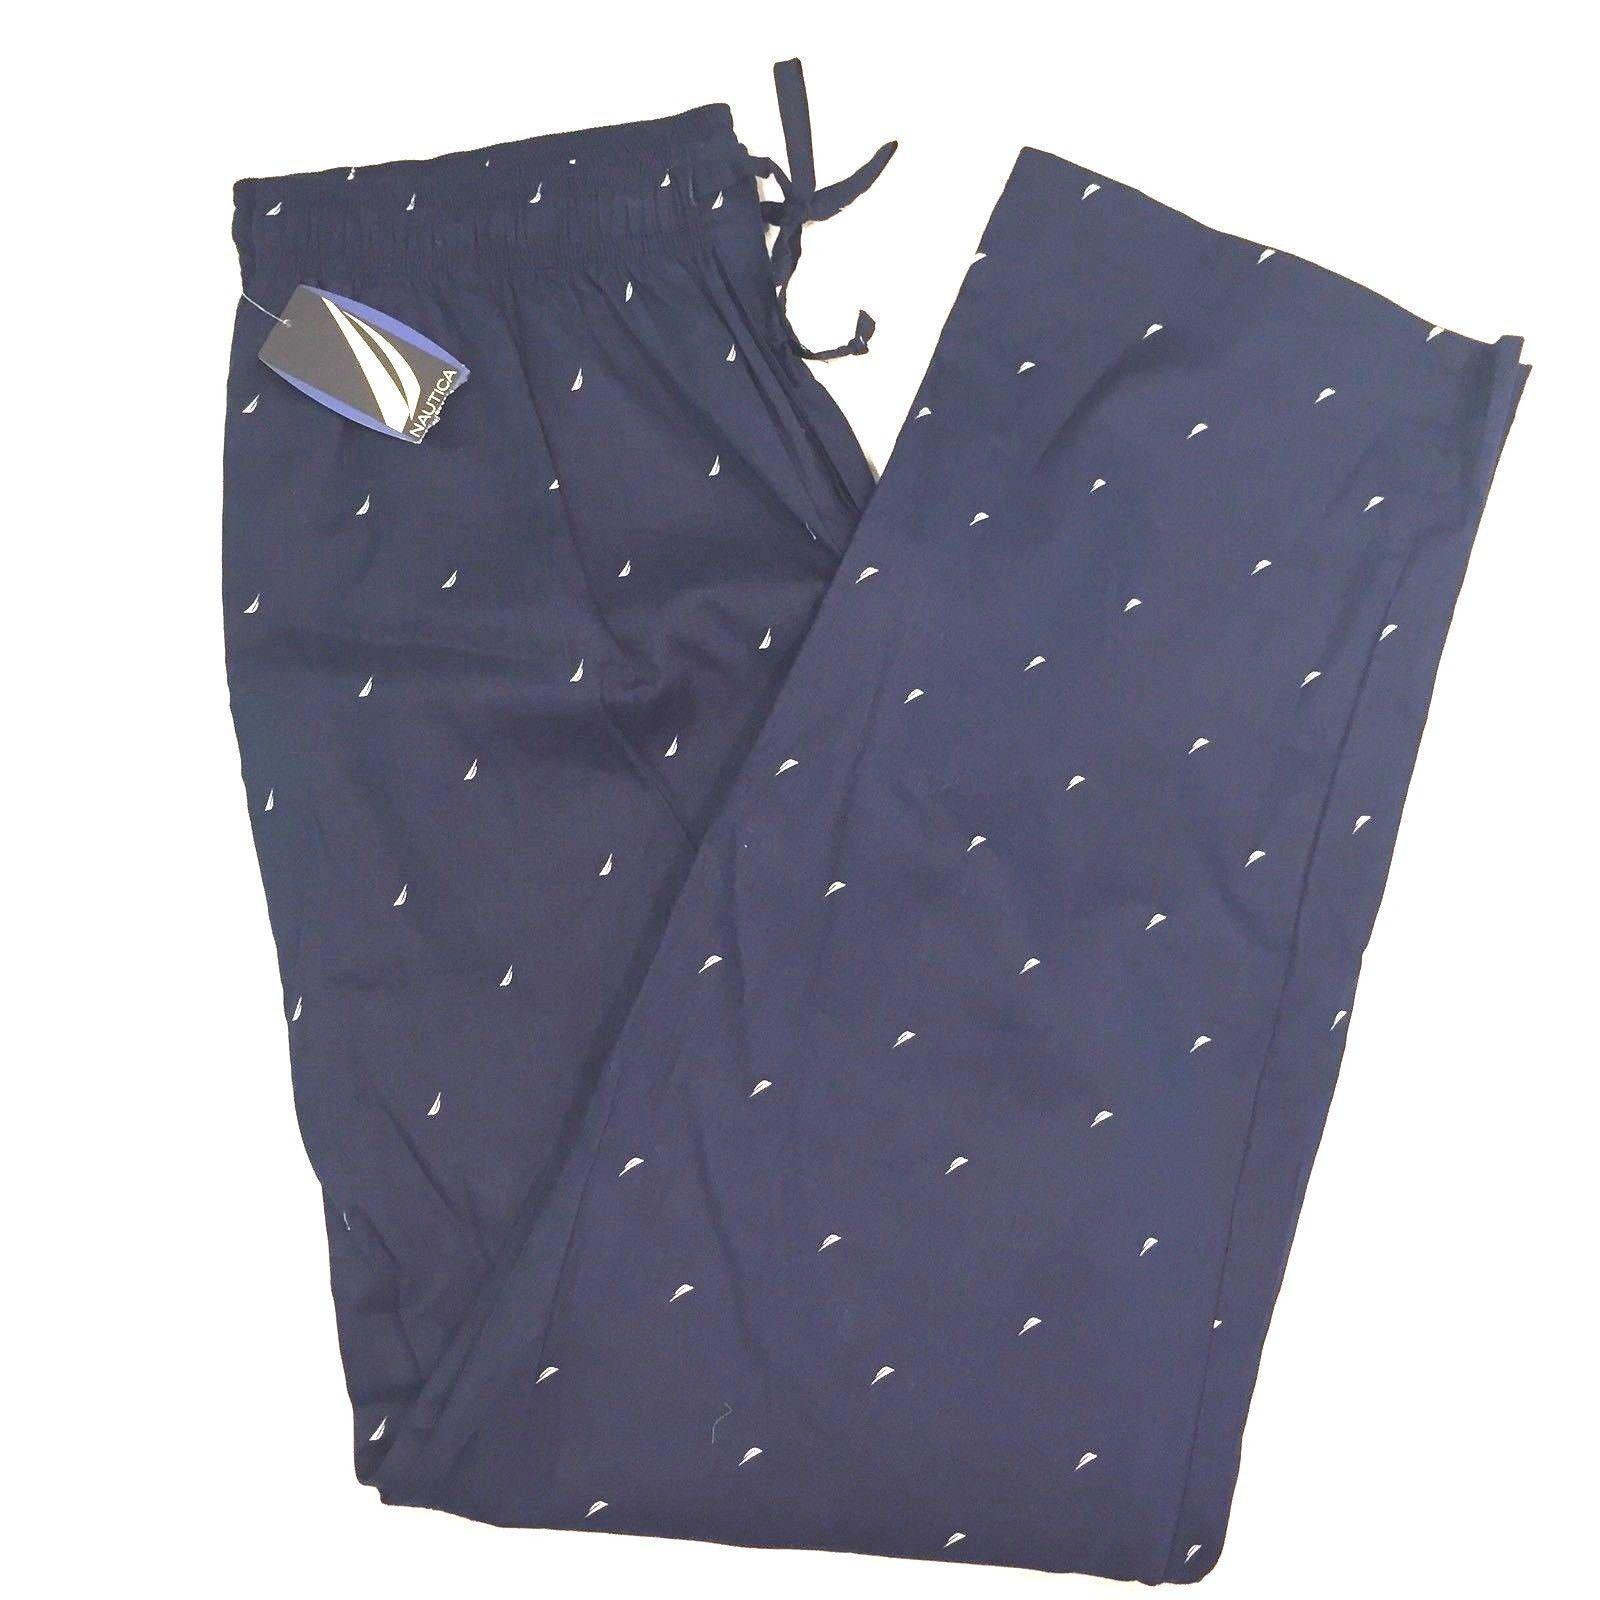 7fb4e5d0a9 New Nautica Signature Mens Pajama Pants Sailboat Logo Large Lounge Navy  Blue | eBay